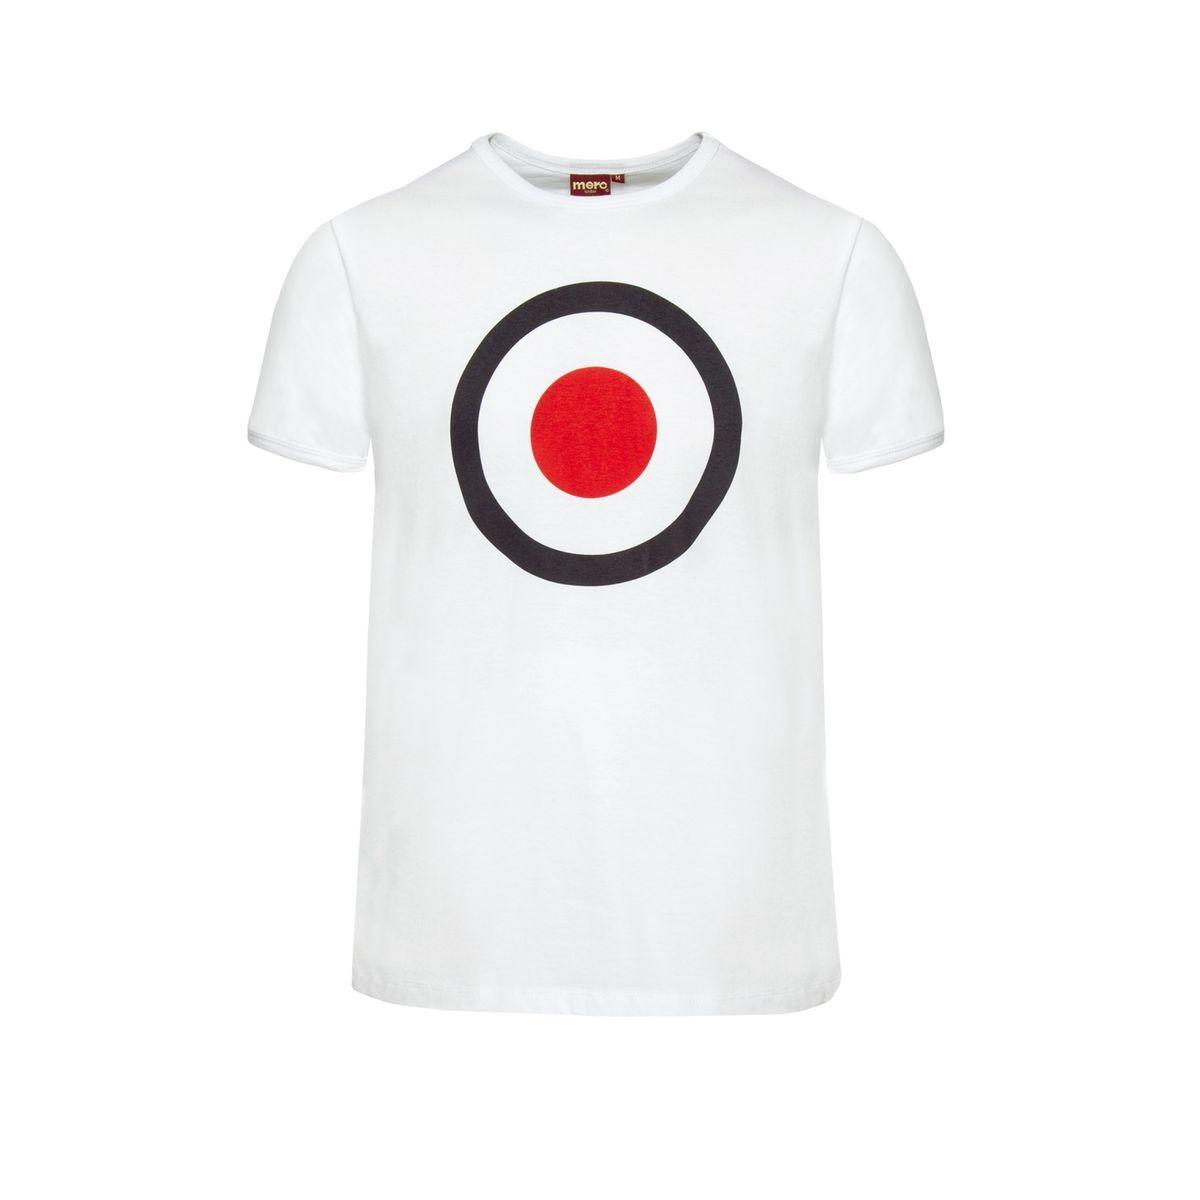 T-shirt imprimé cible TICKET